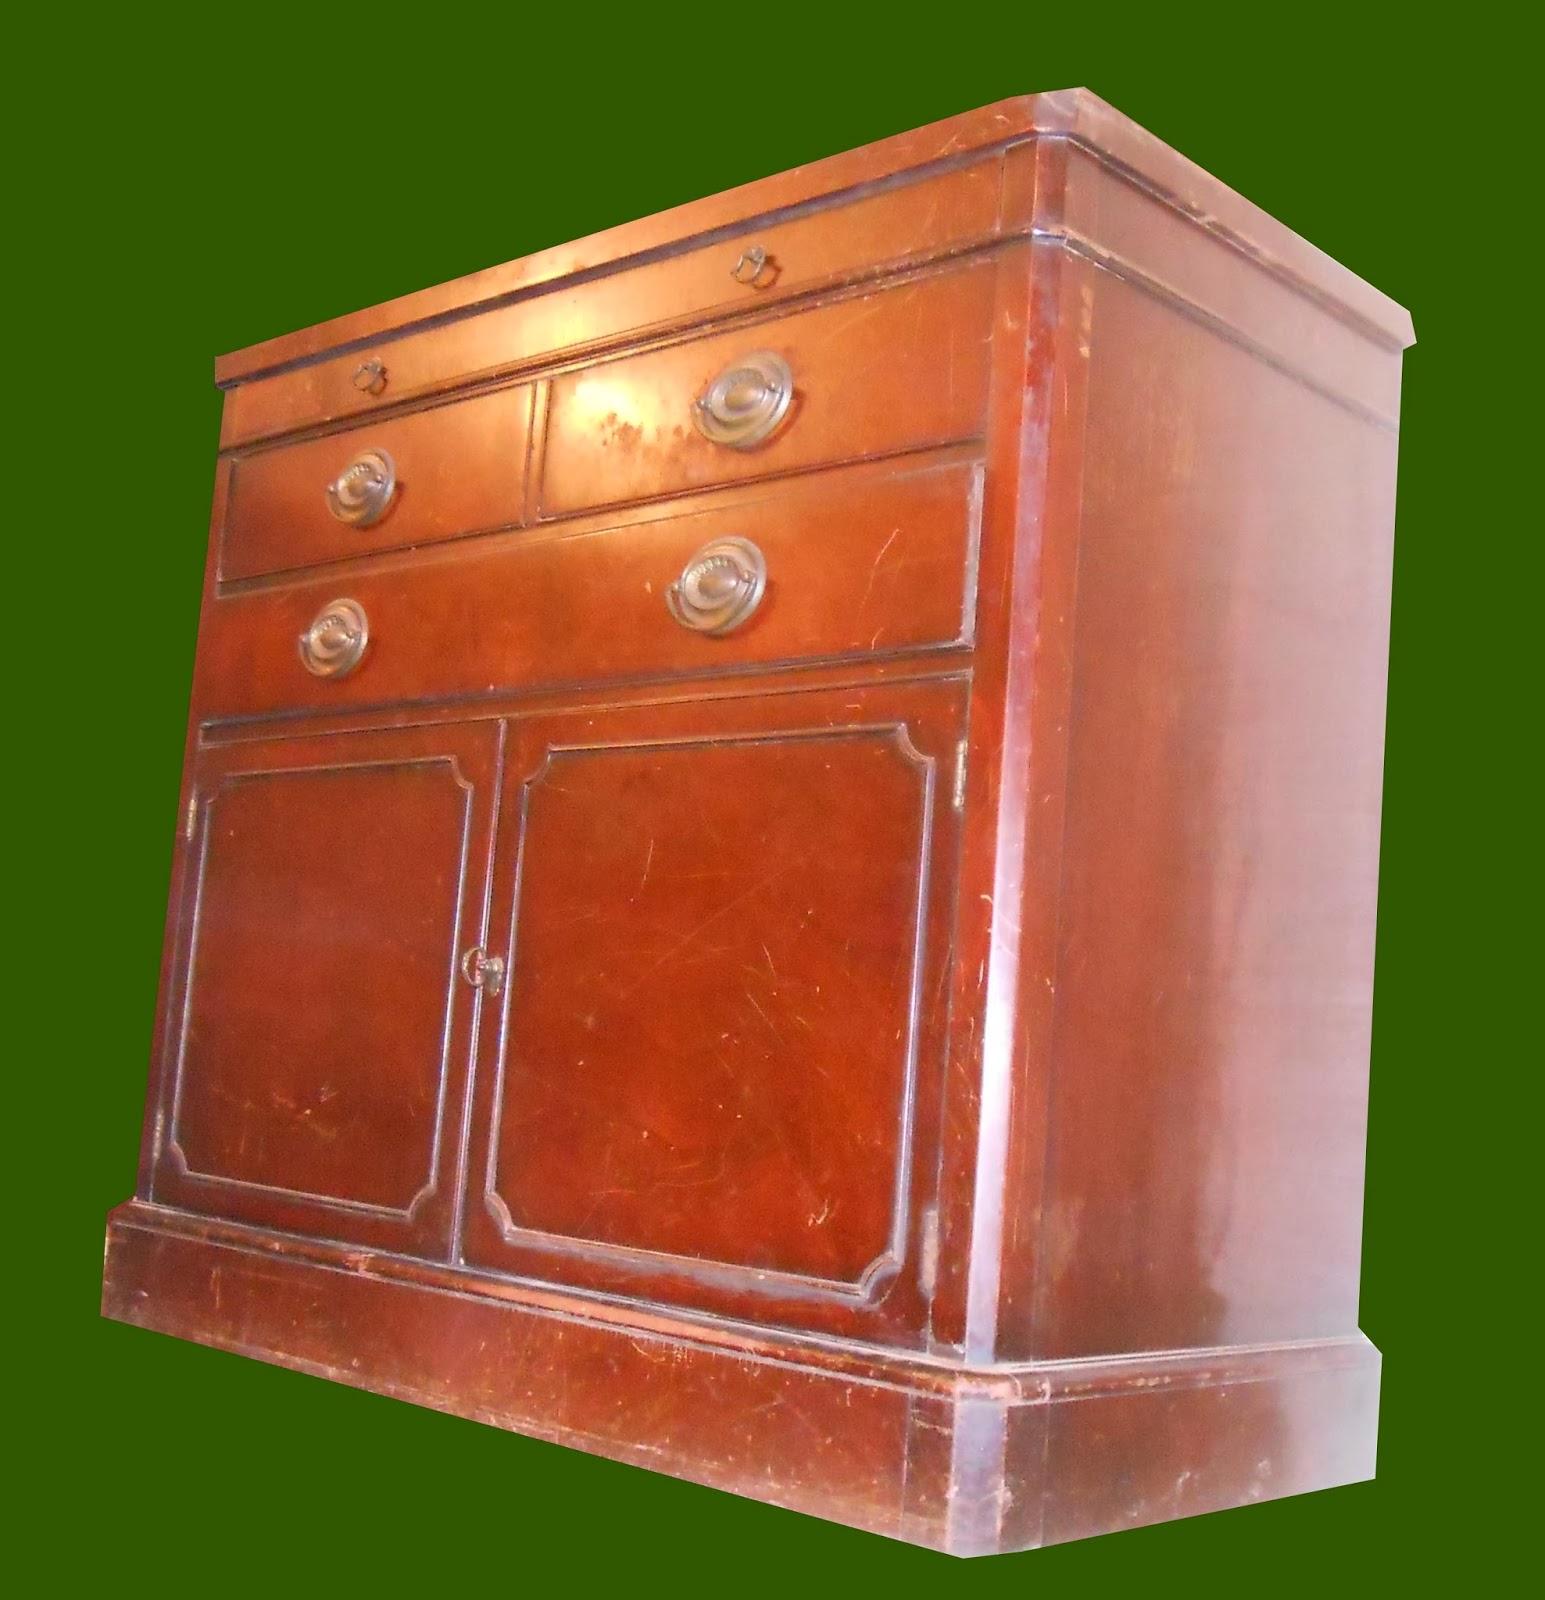 Uhuru Furniture Amp Collectibles Mahogany Duncan Phyfe